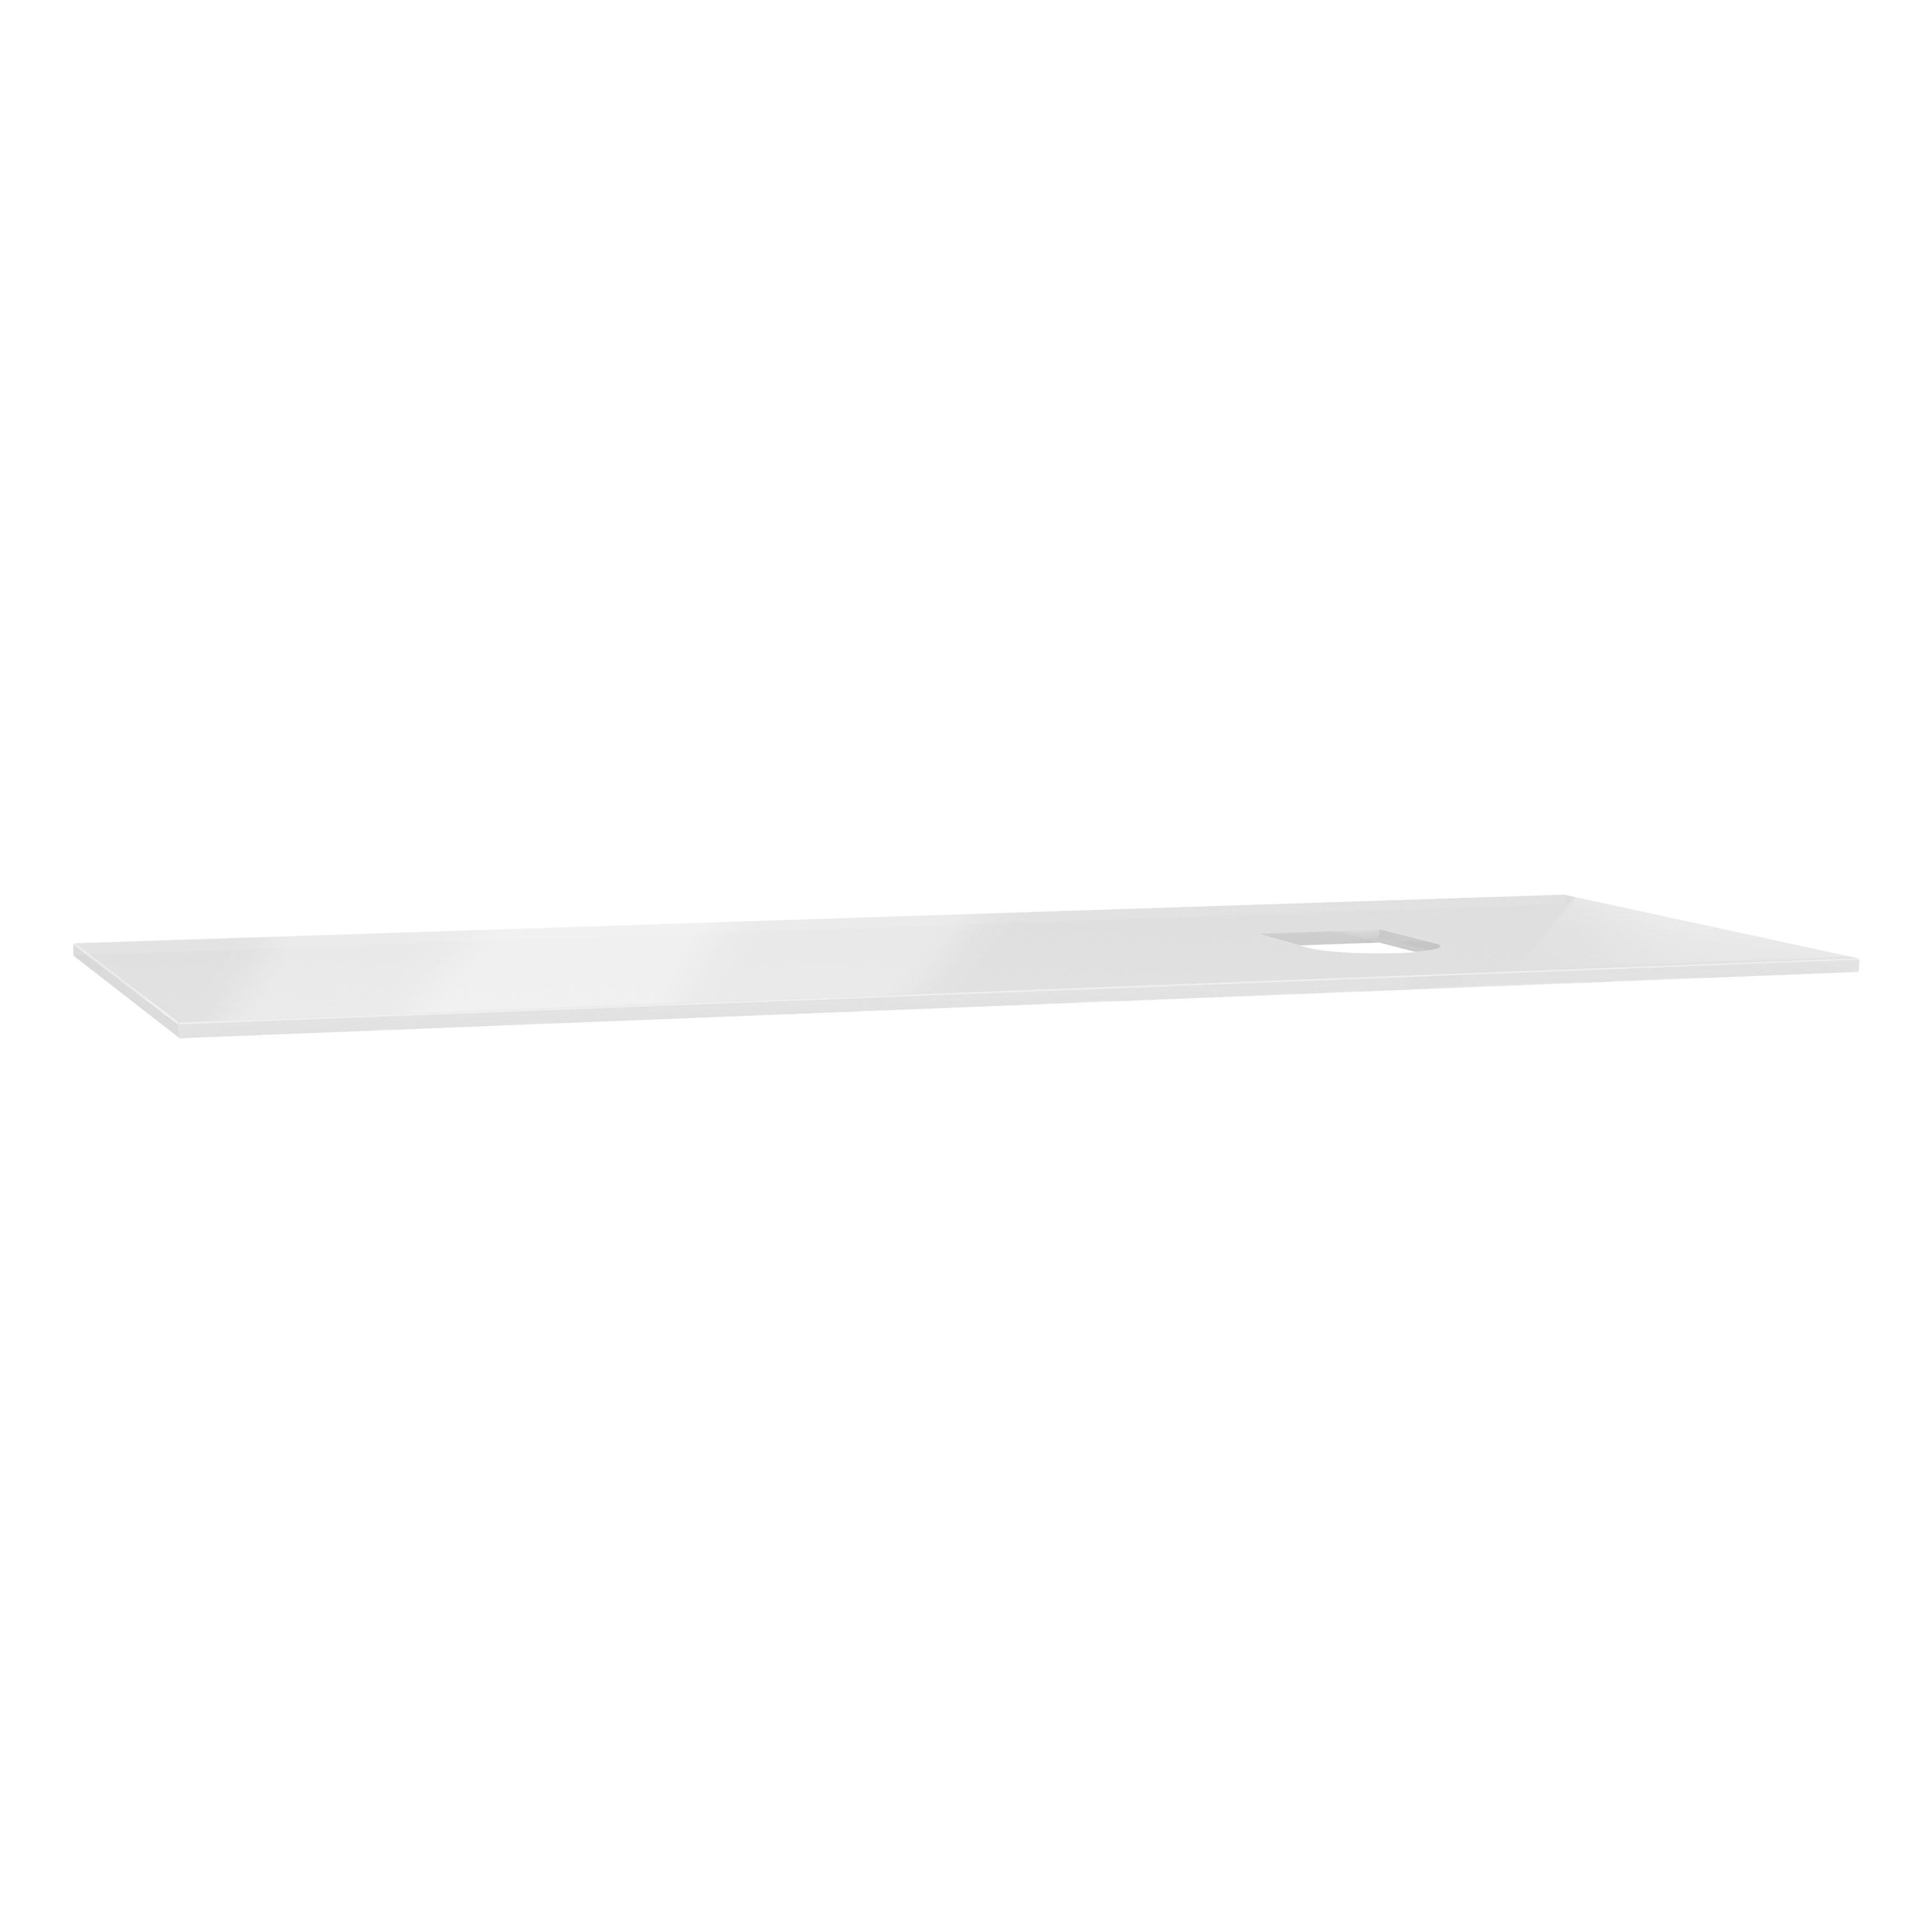 Origin plan de toilette, 120 cm, verre blanc, droite